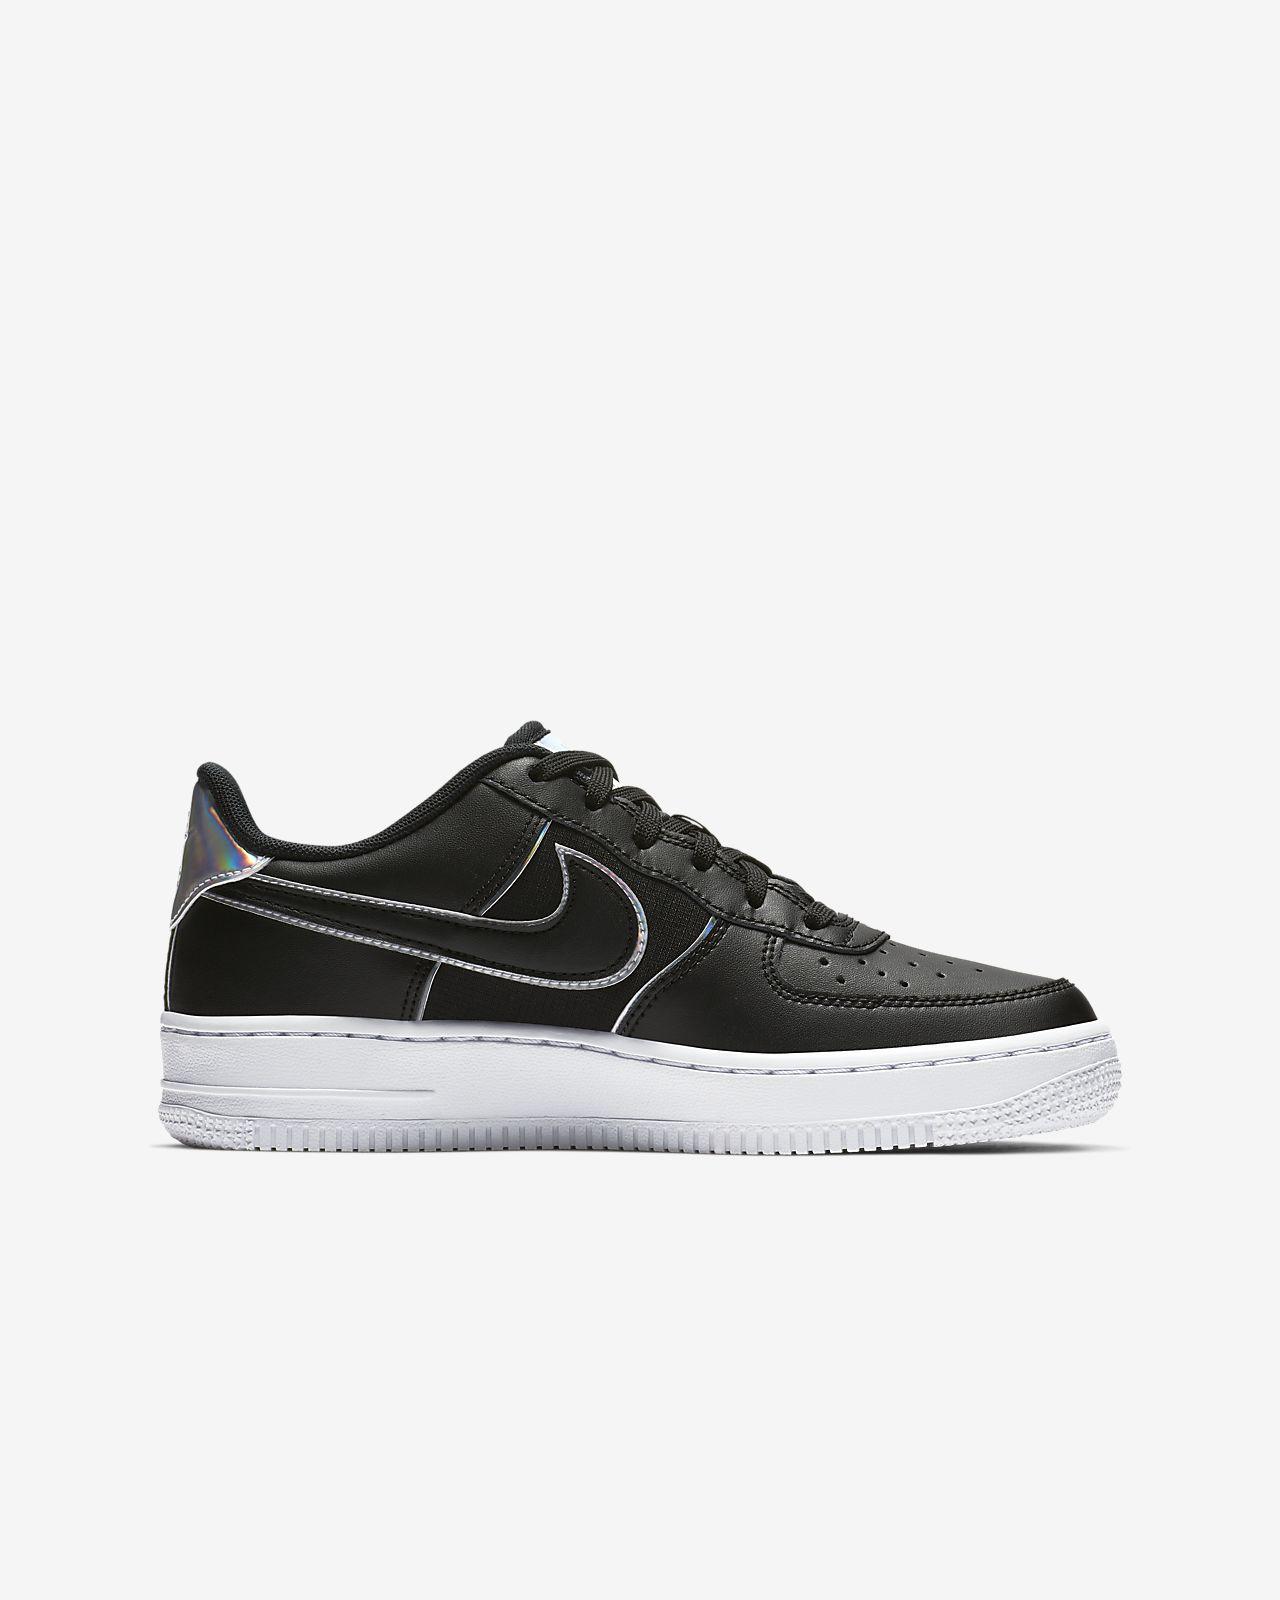 c7f6b5ee62a Nike Air Force 1 LV8 4 Big Kids  Shoe. Nike.com